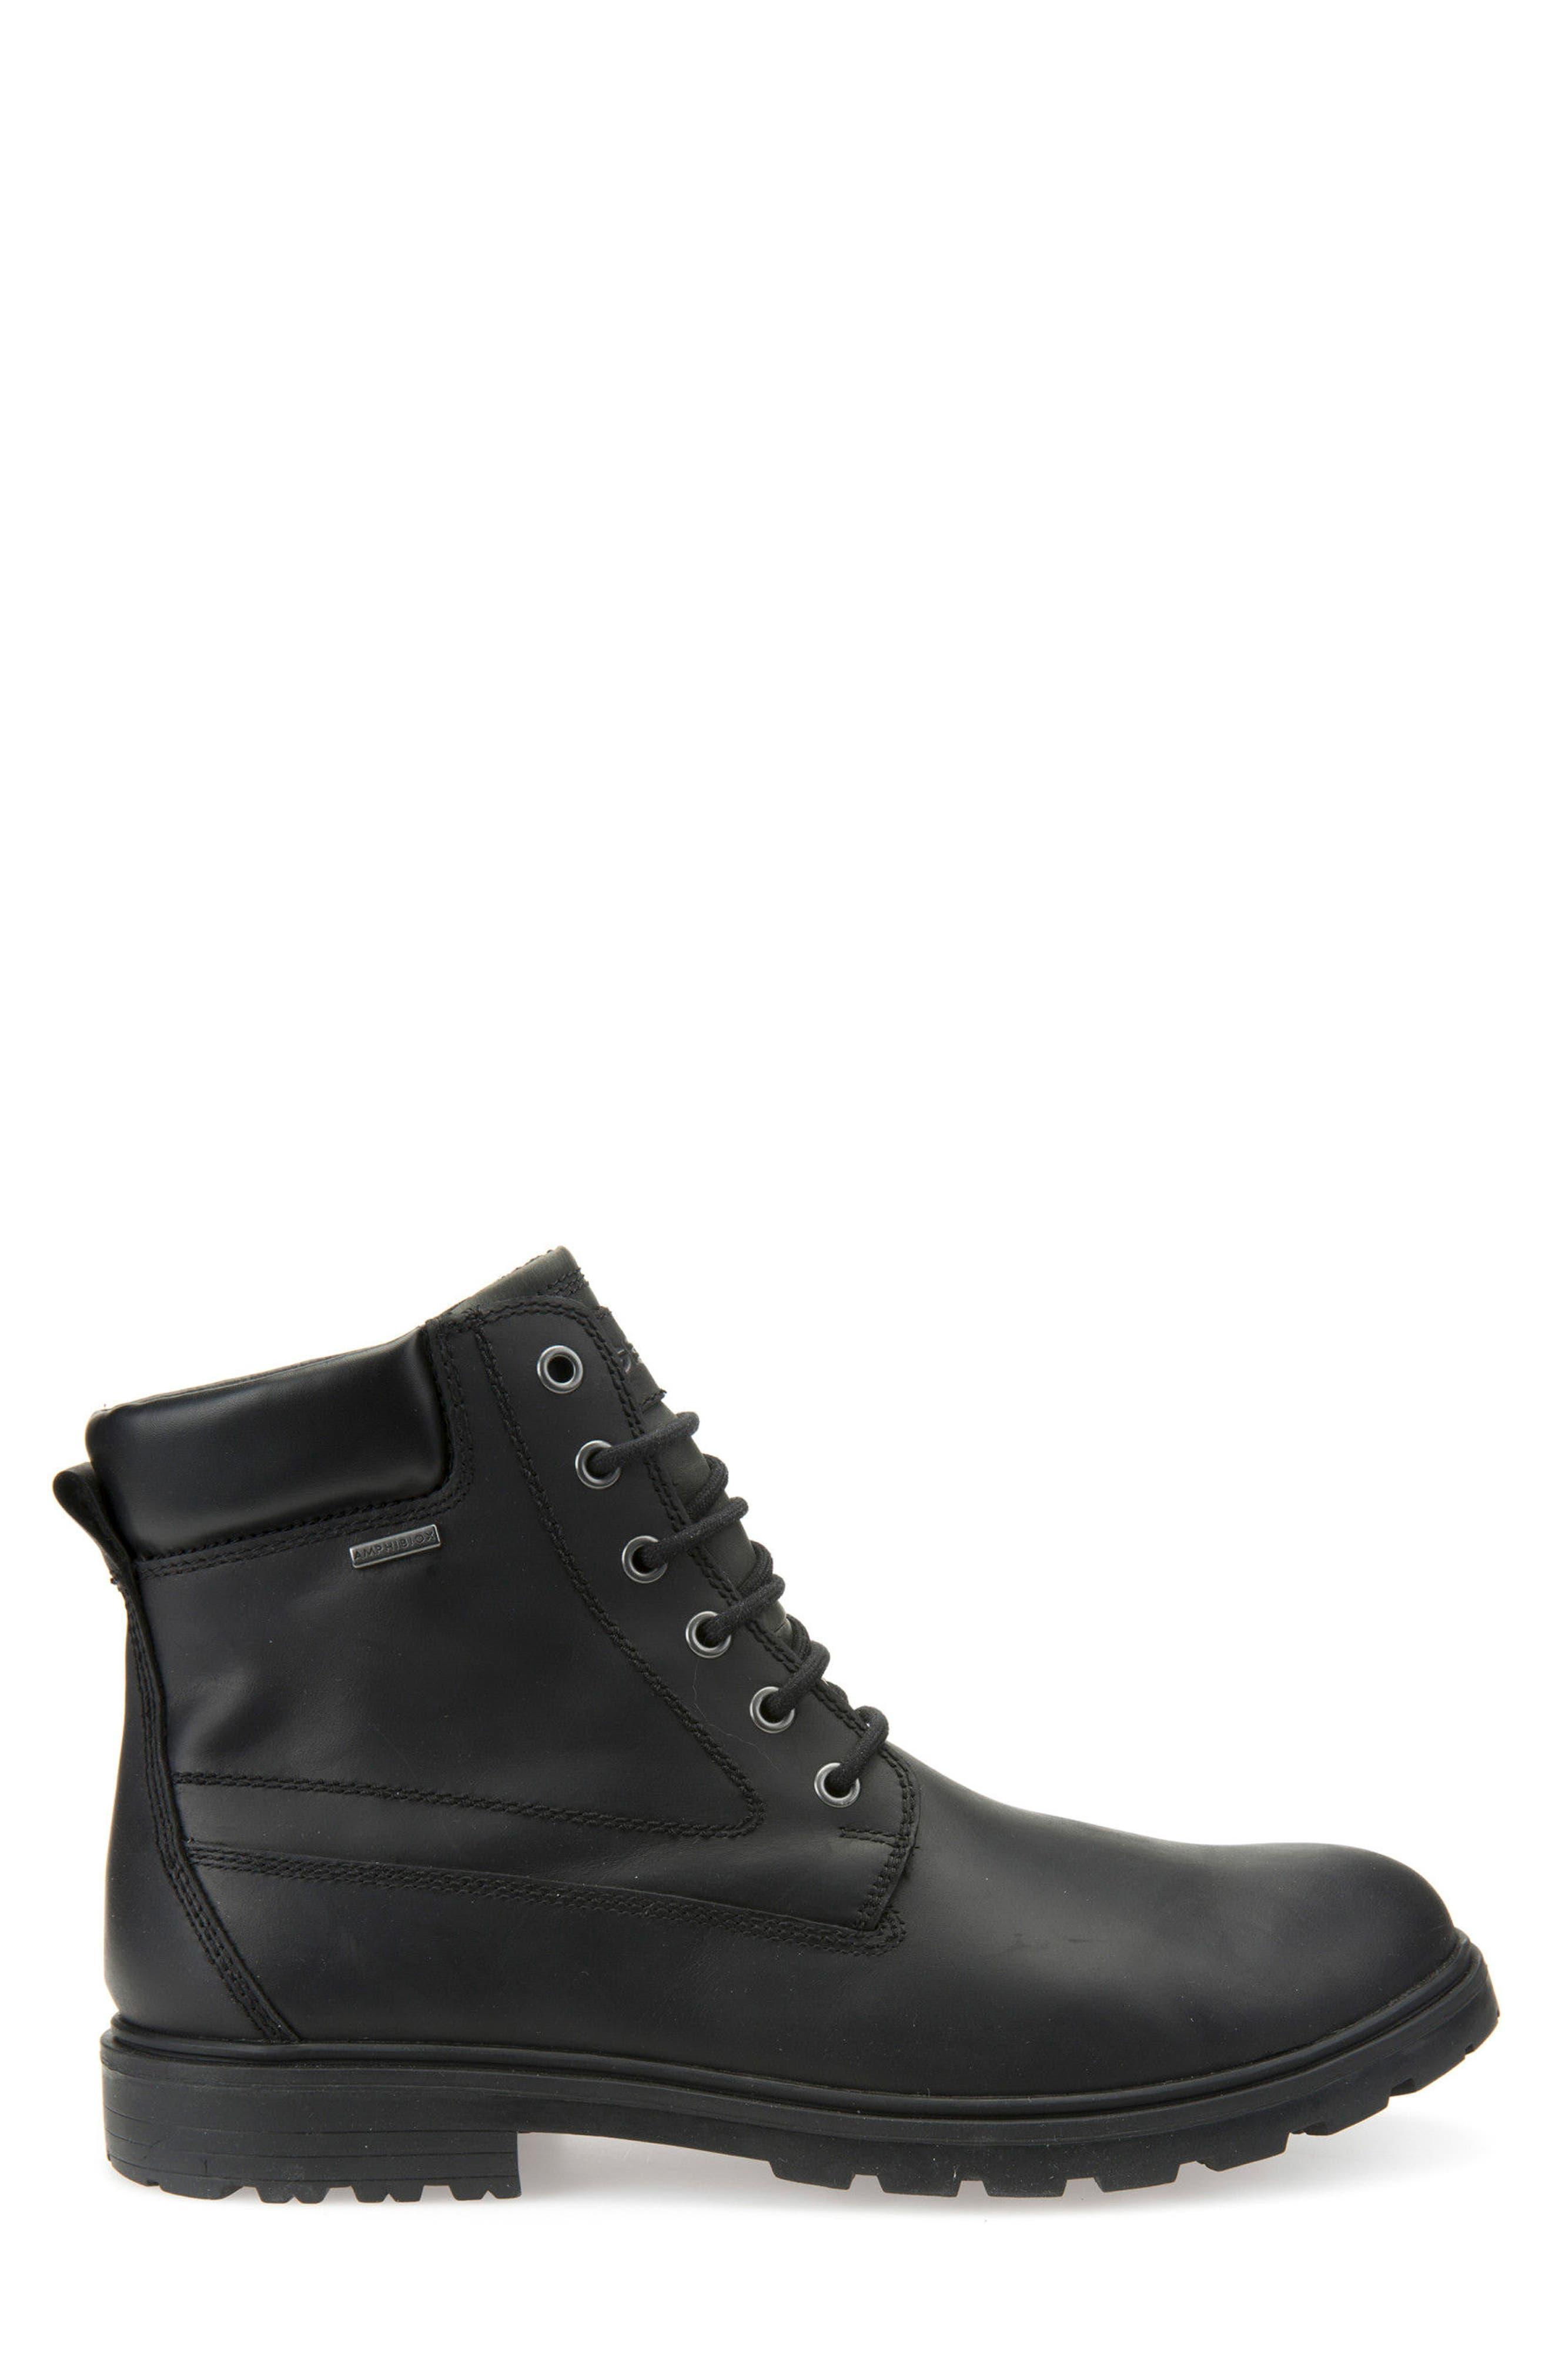 Makim Waterproof Plain Toe Boot,                             Alternate thumbnail 3, color,                             Black